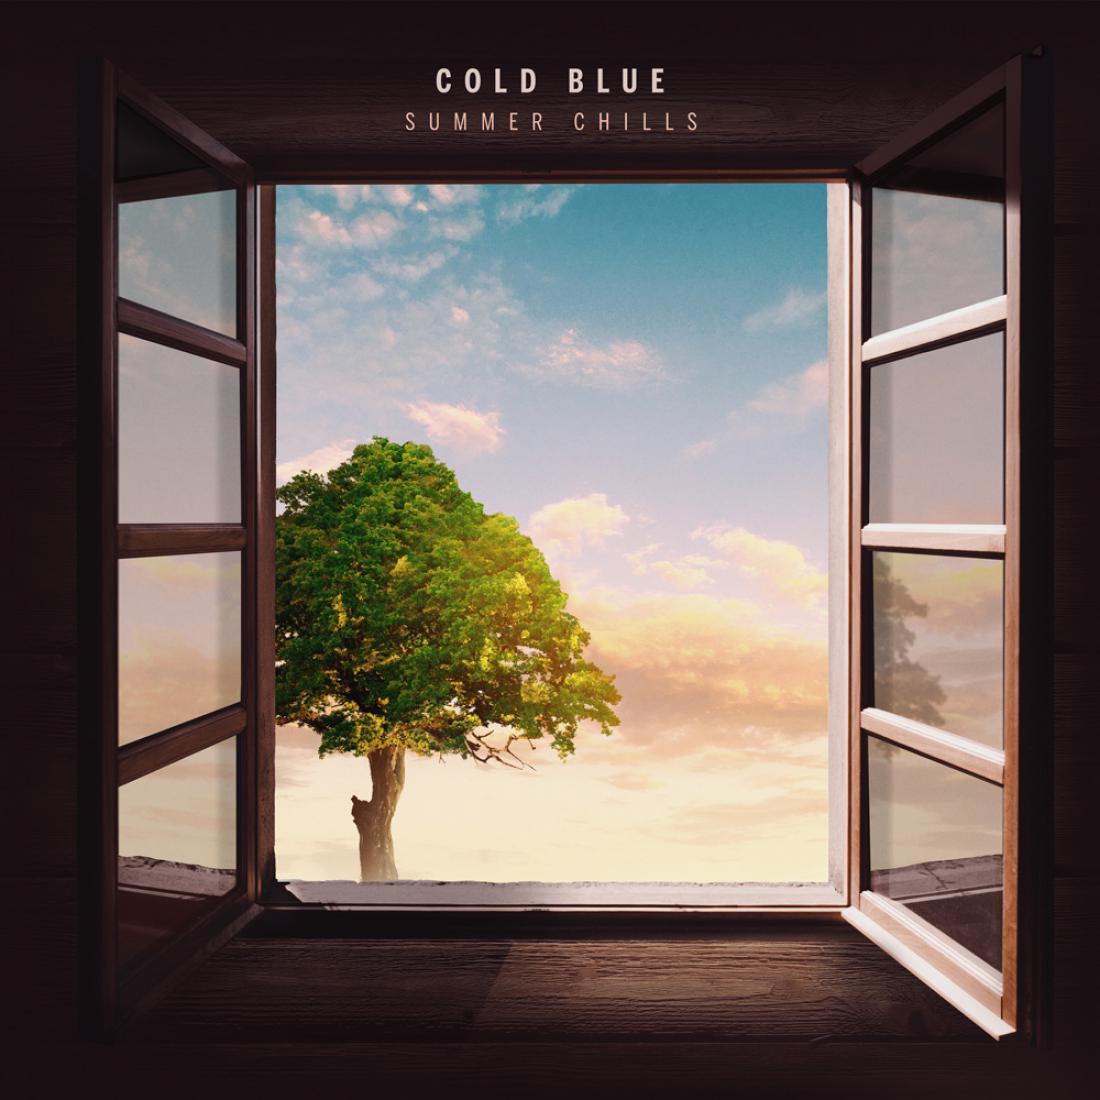 Album: Cold Blue - Summer Chills